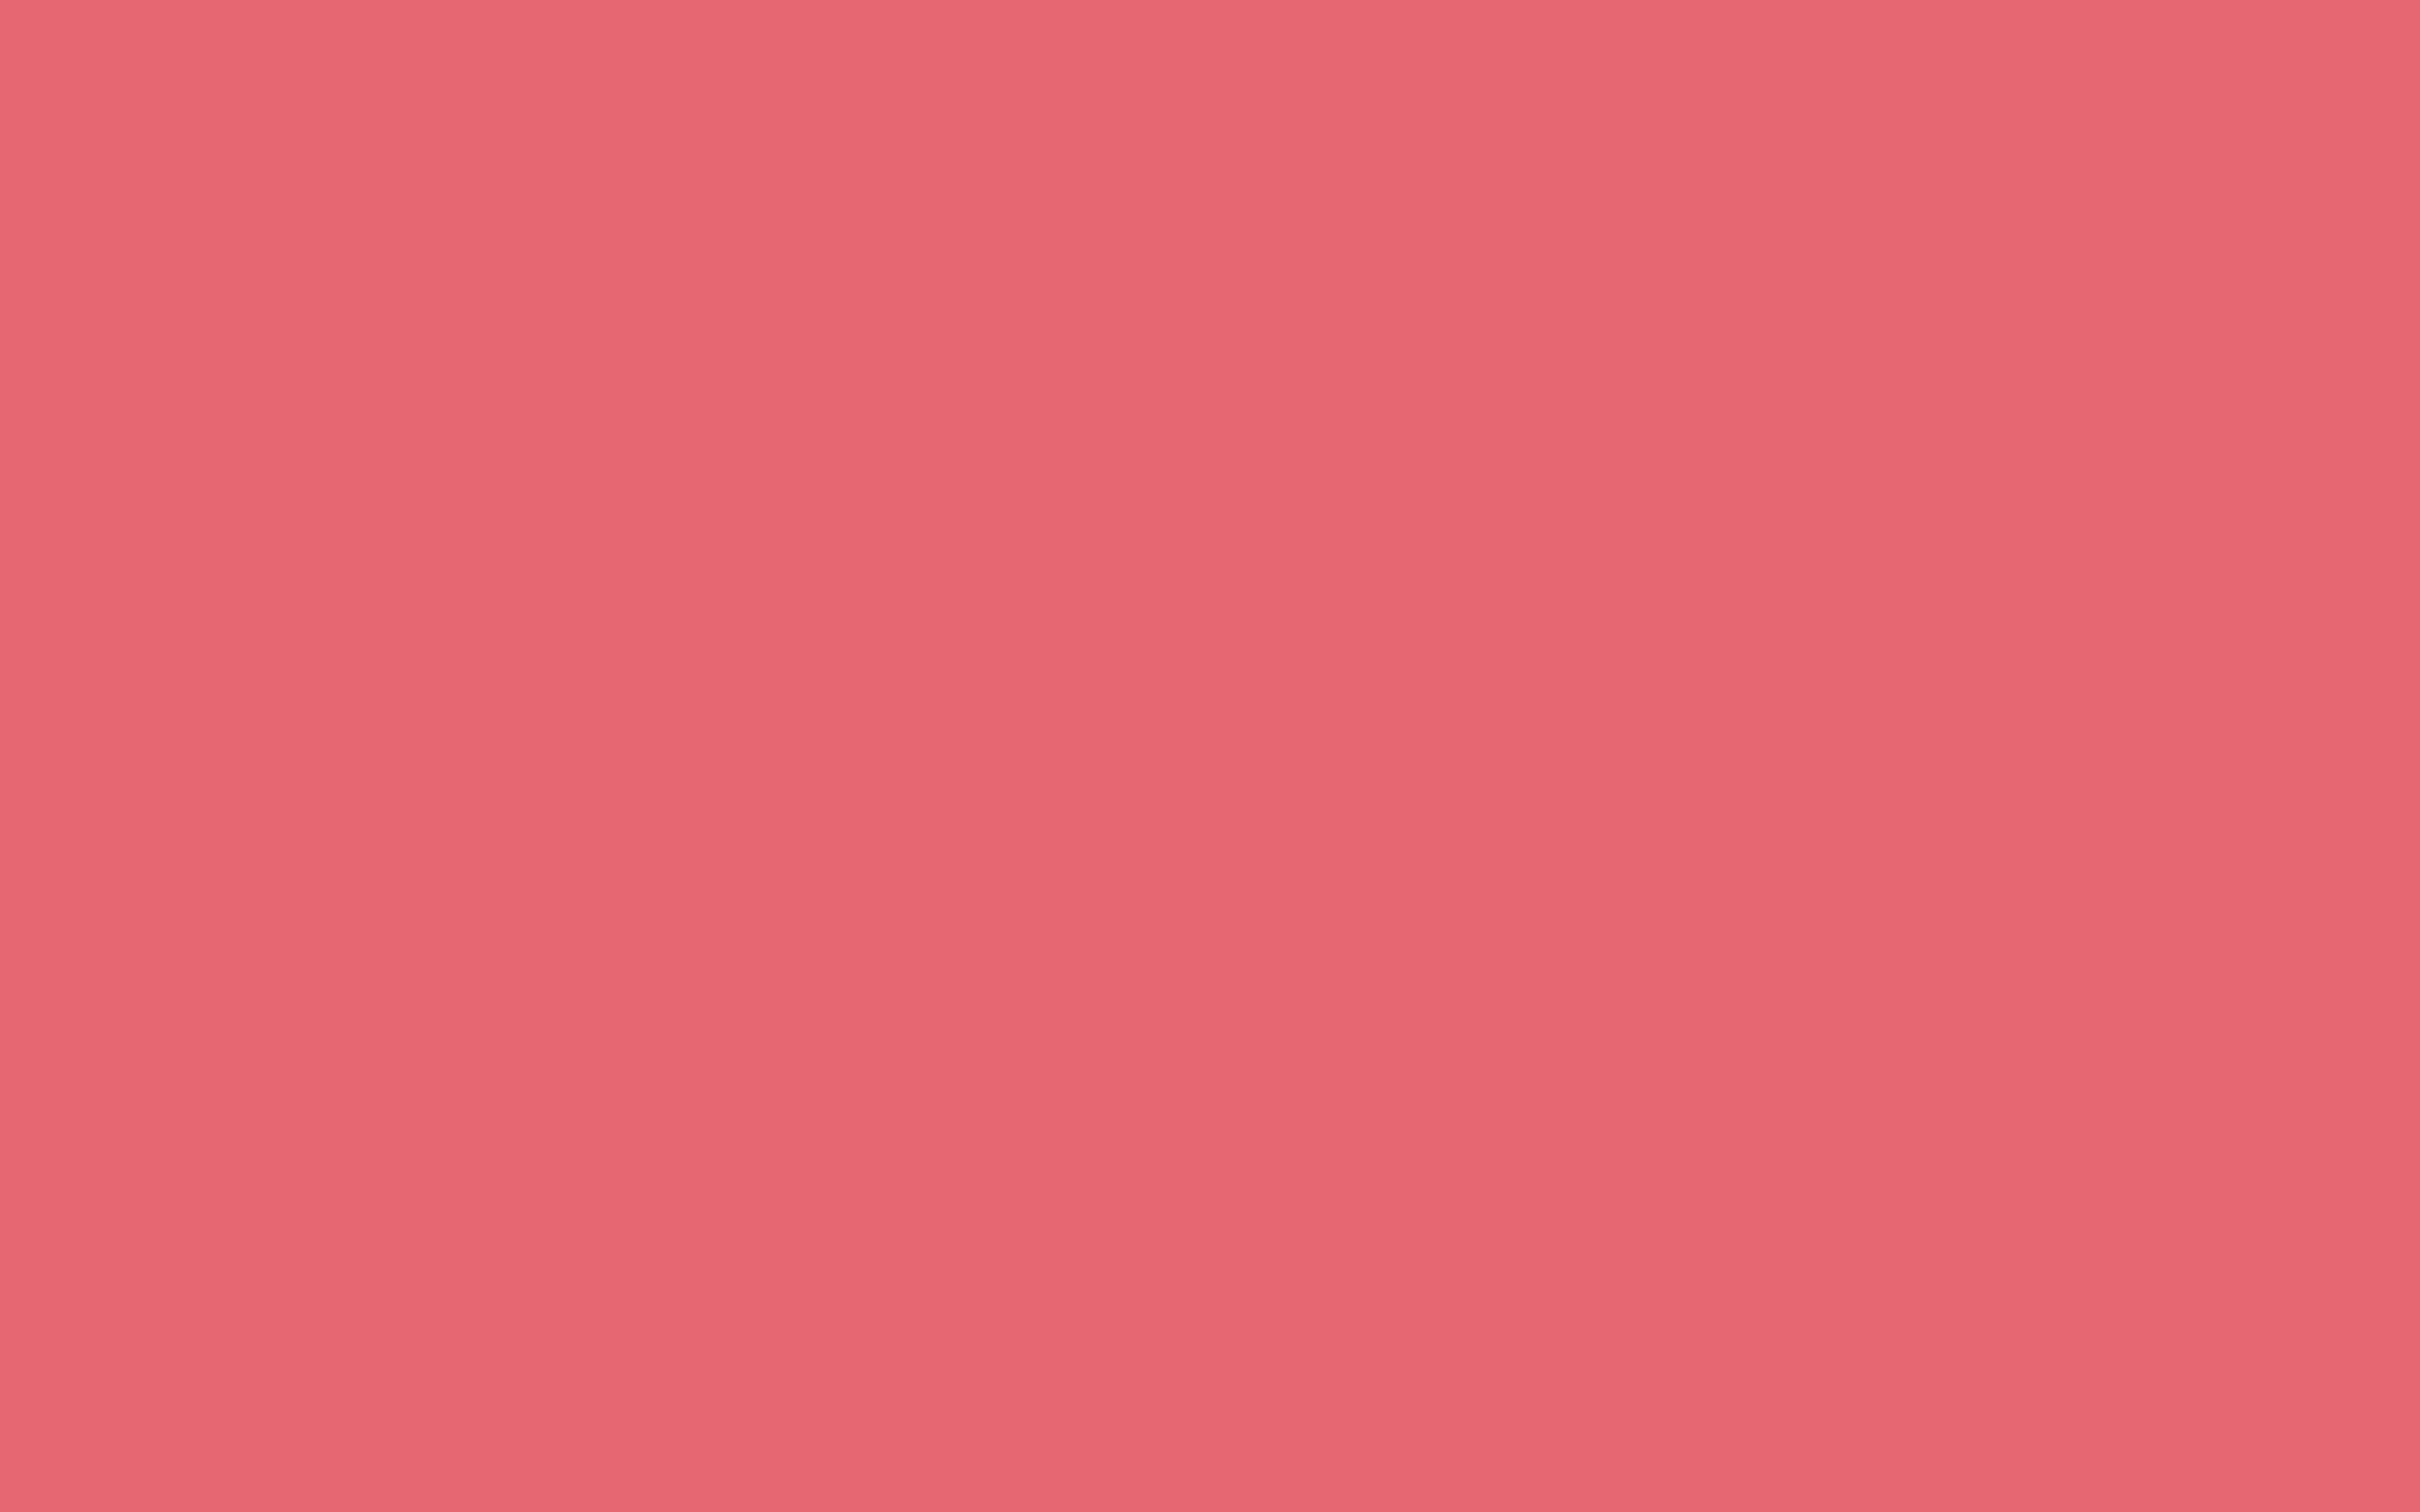 2560x1600 Light Carmine Pink Solid Color Background